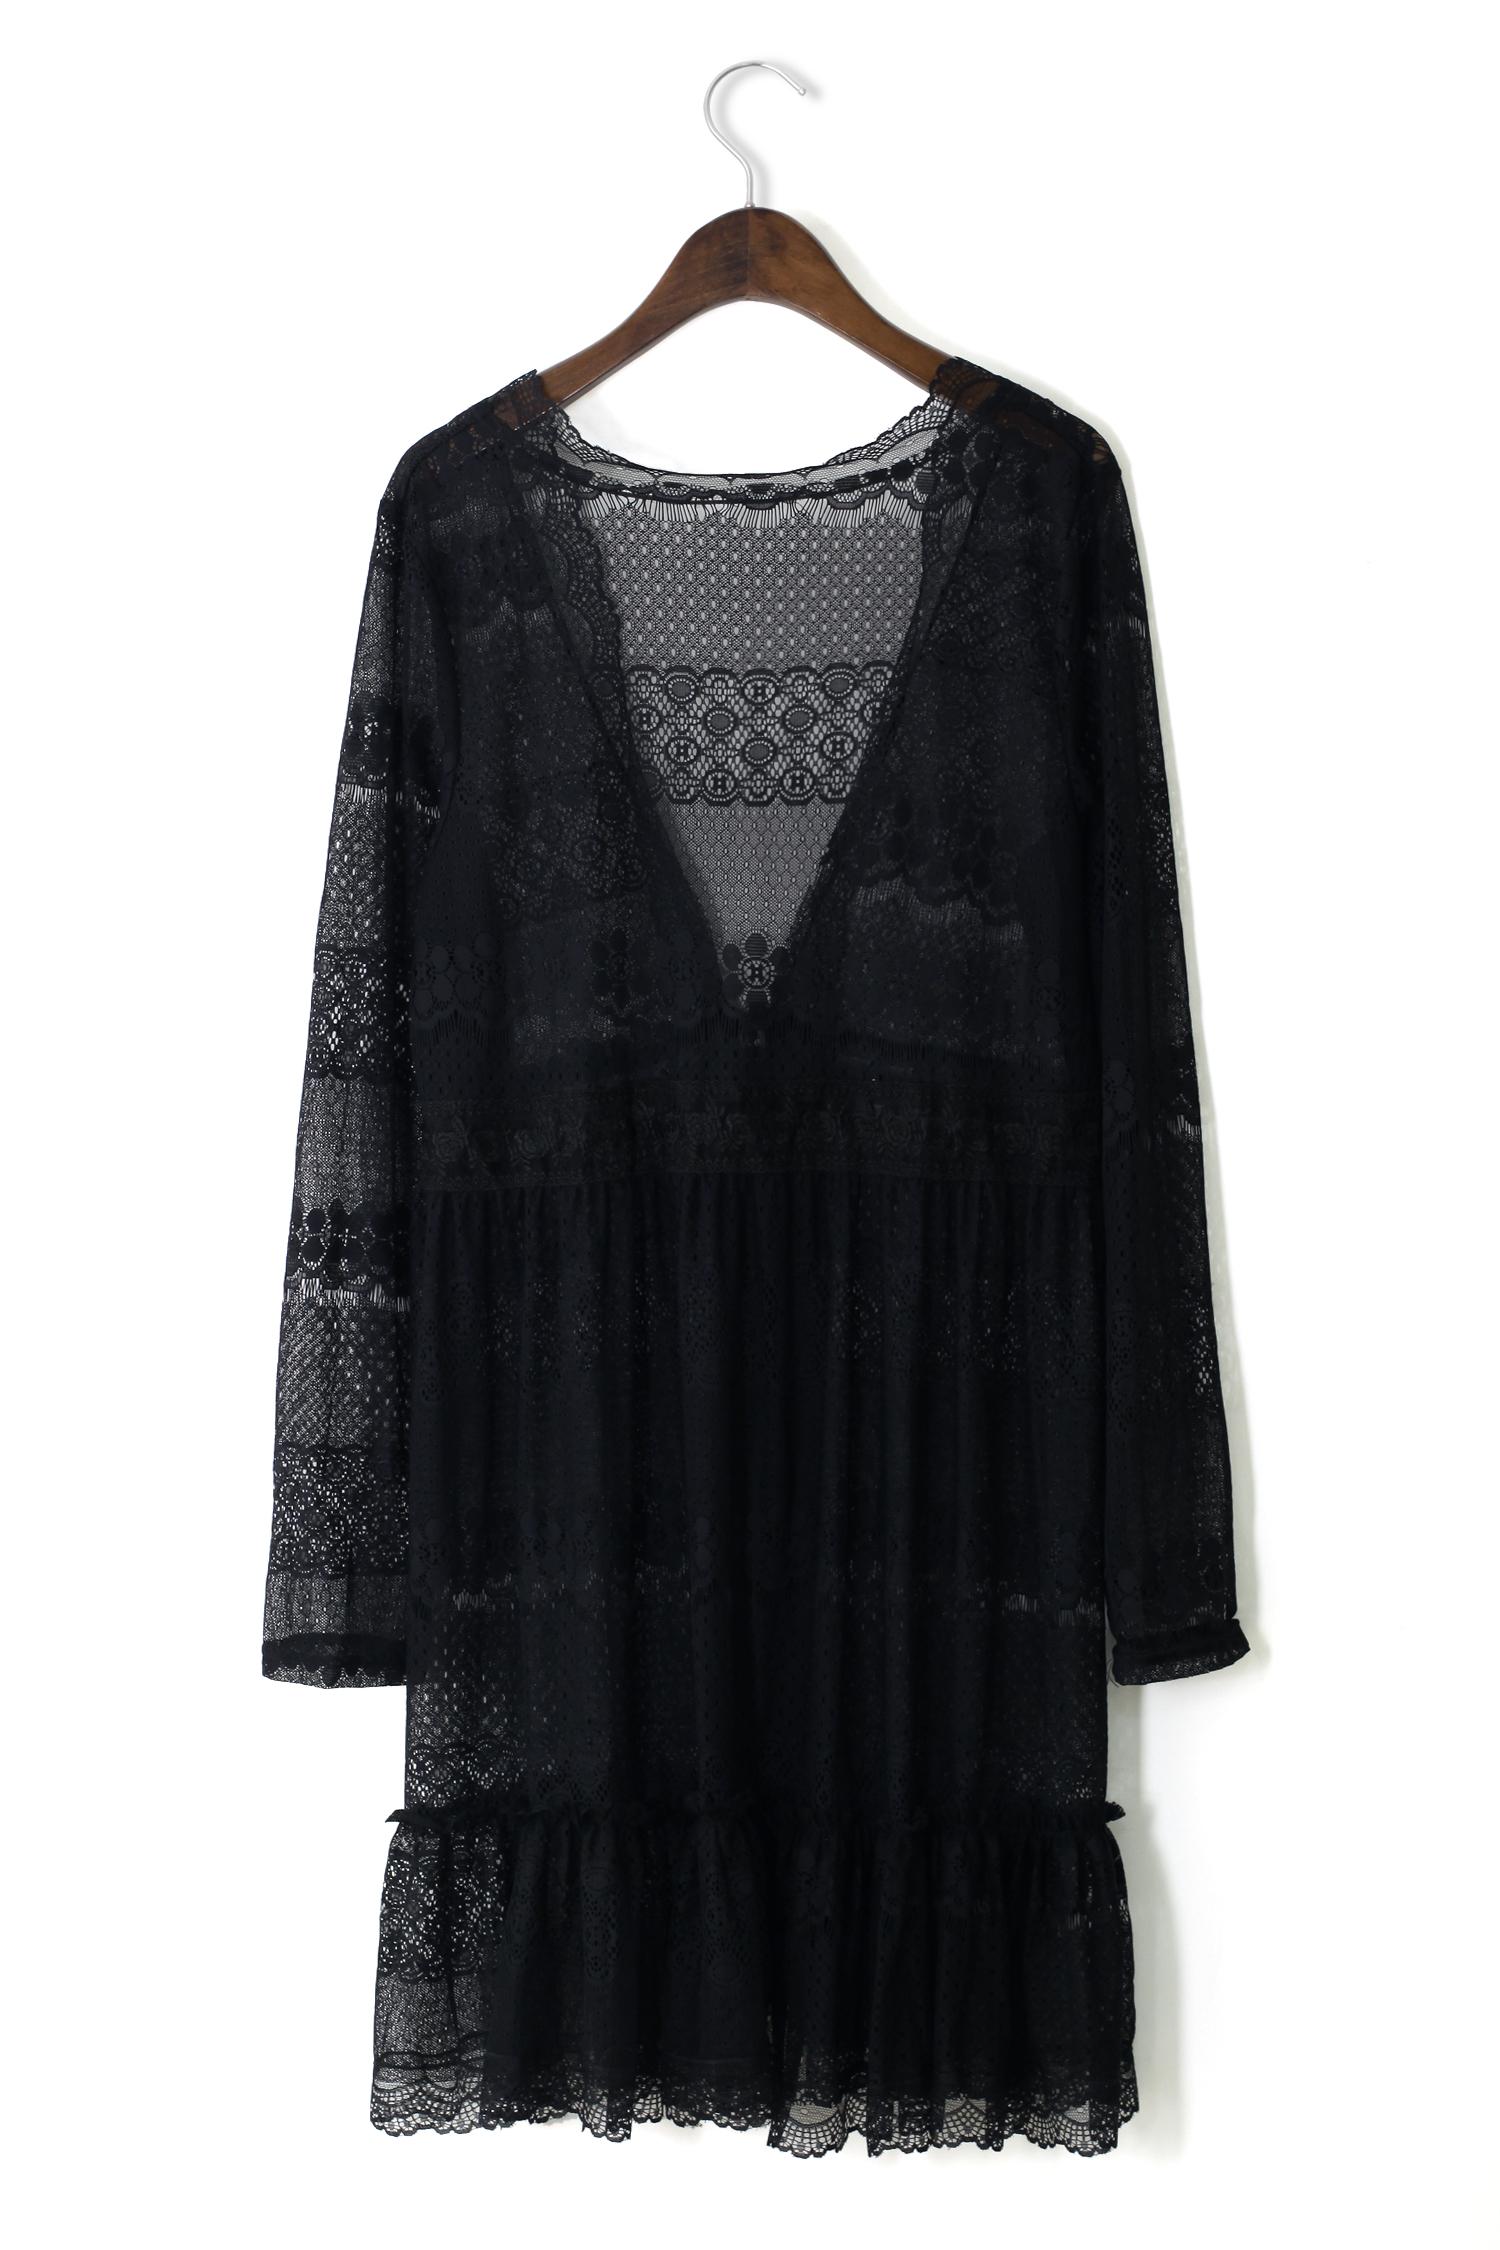 Full Lace Cardigan in Black - Retro, Indie and Unique Fashion